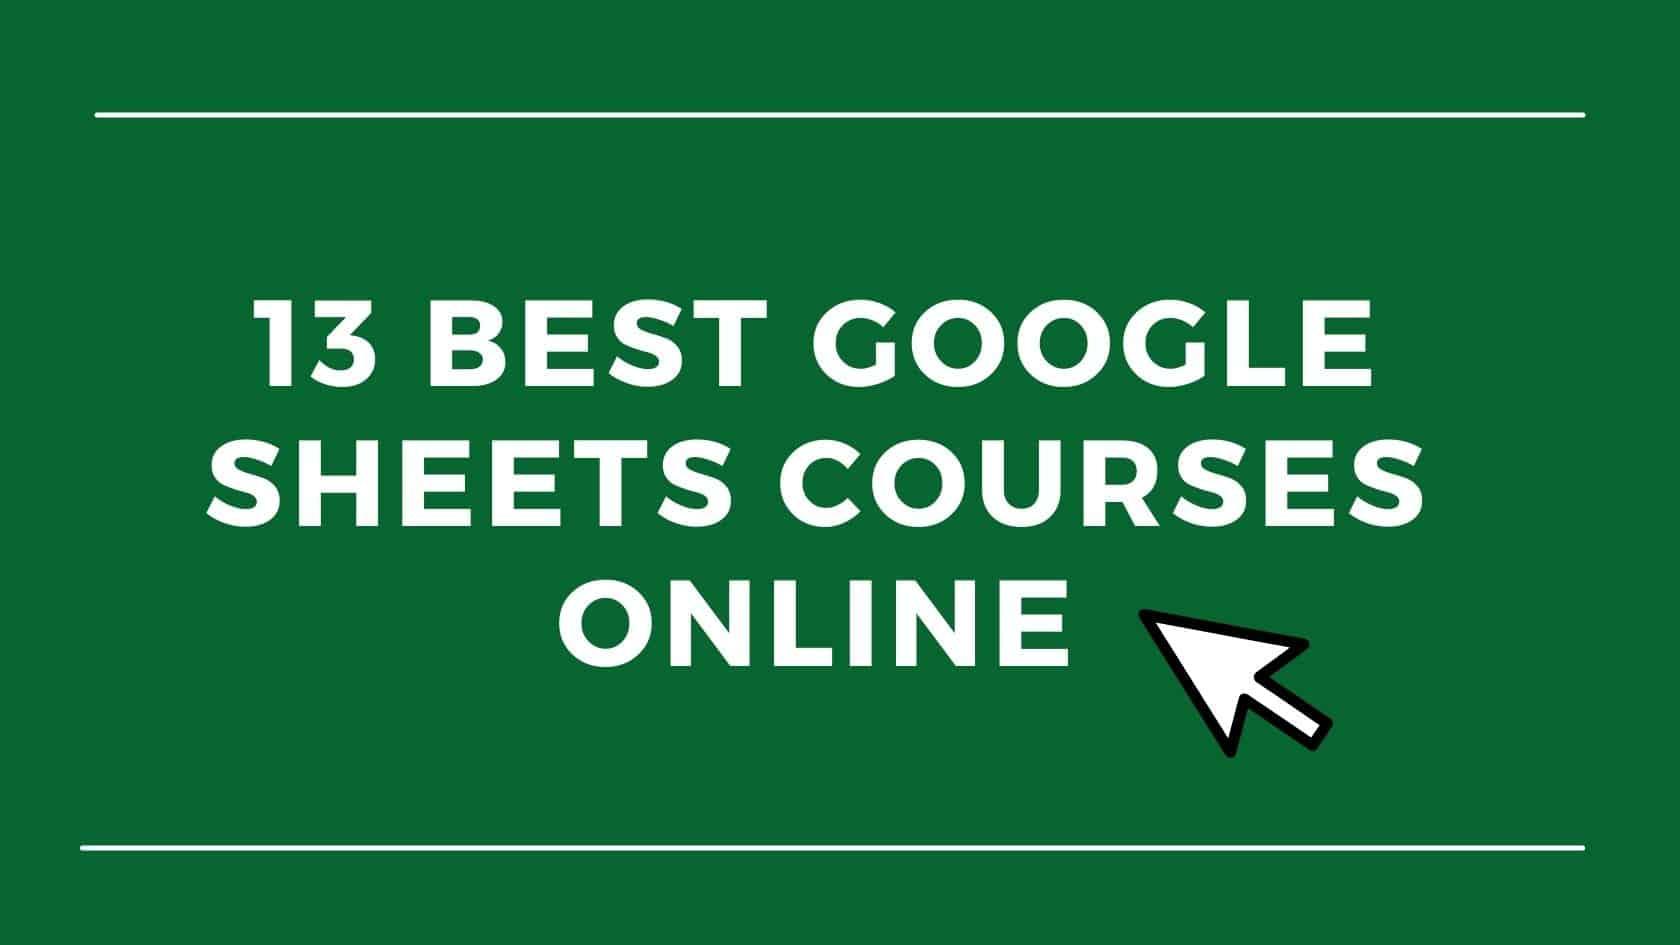 Best Google Sheets Courses 2021